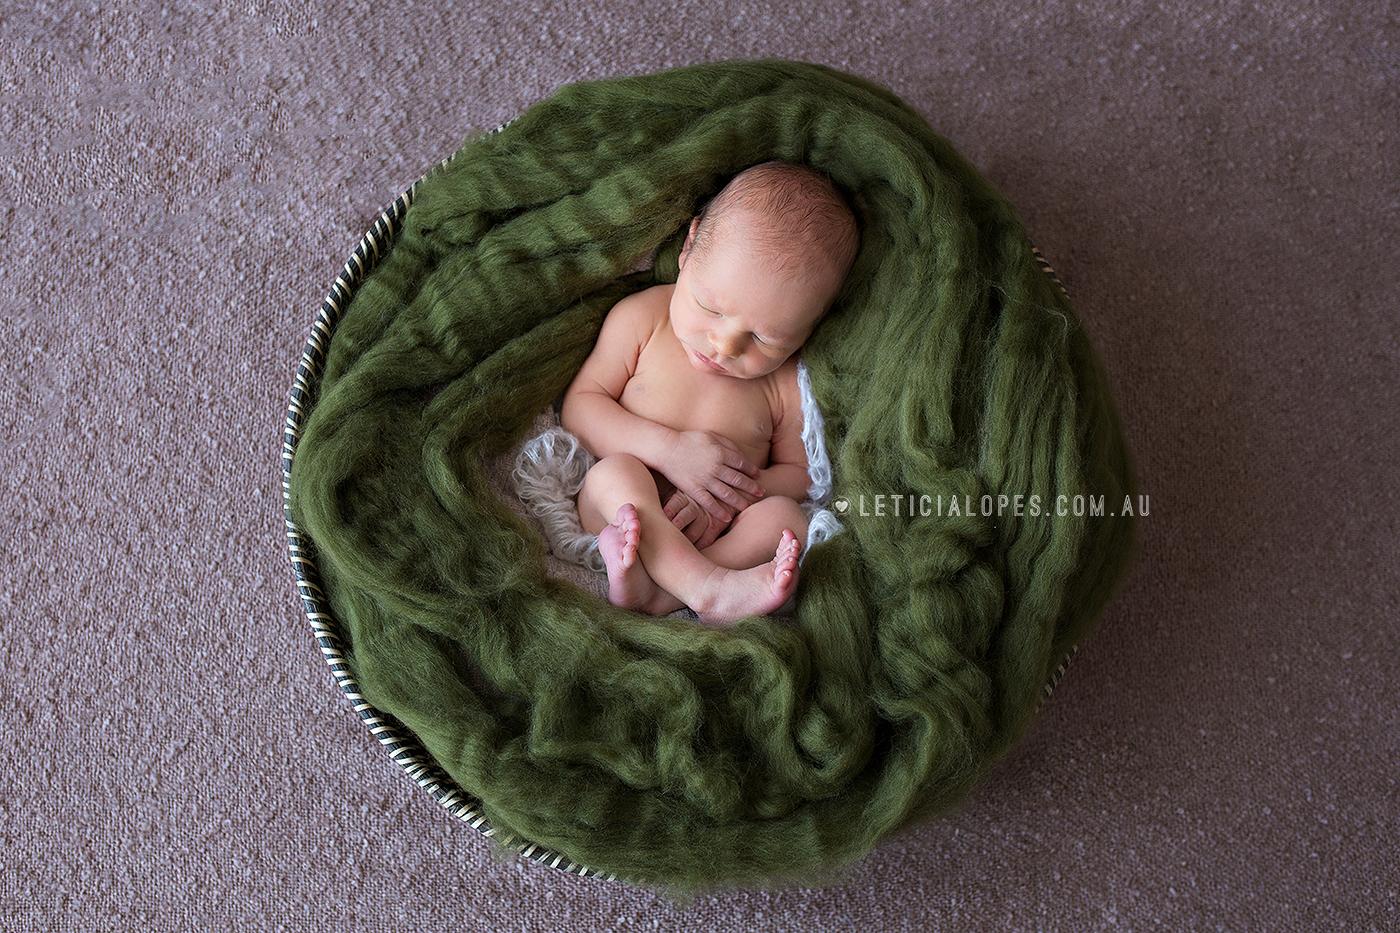 shepparton-newborn-photographer17.jpg